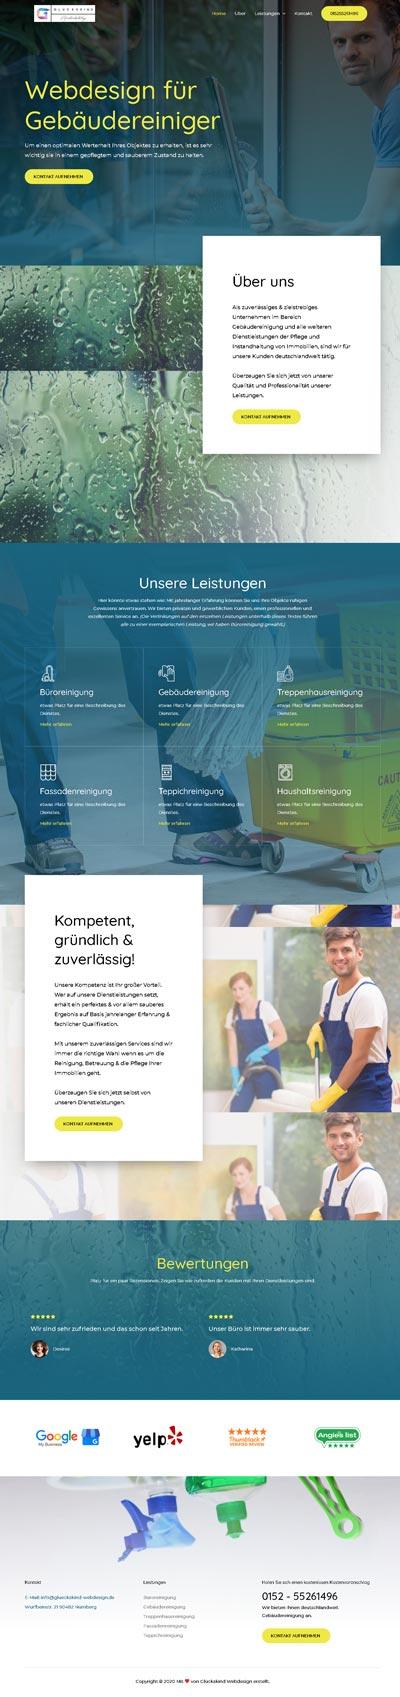 Handwerk Cleany - Glückskind Webdesign Musterkatalog